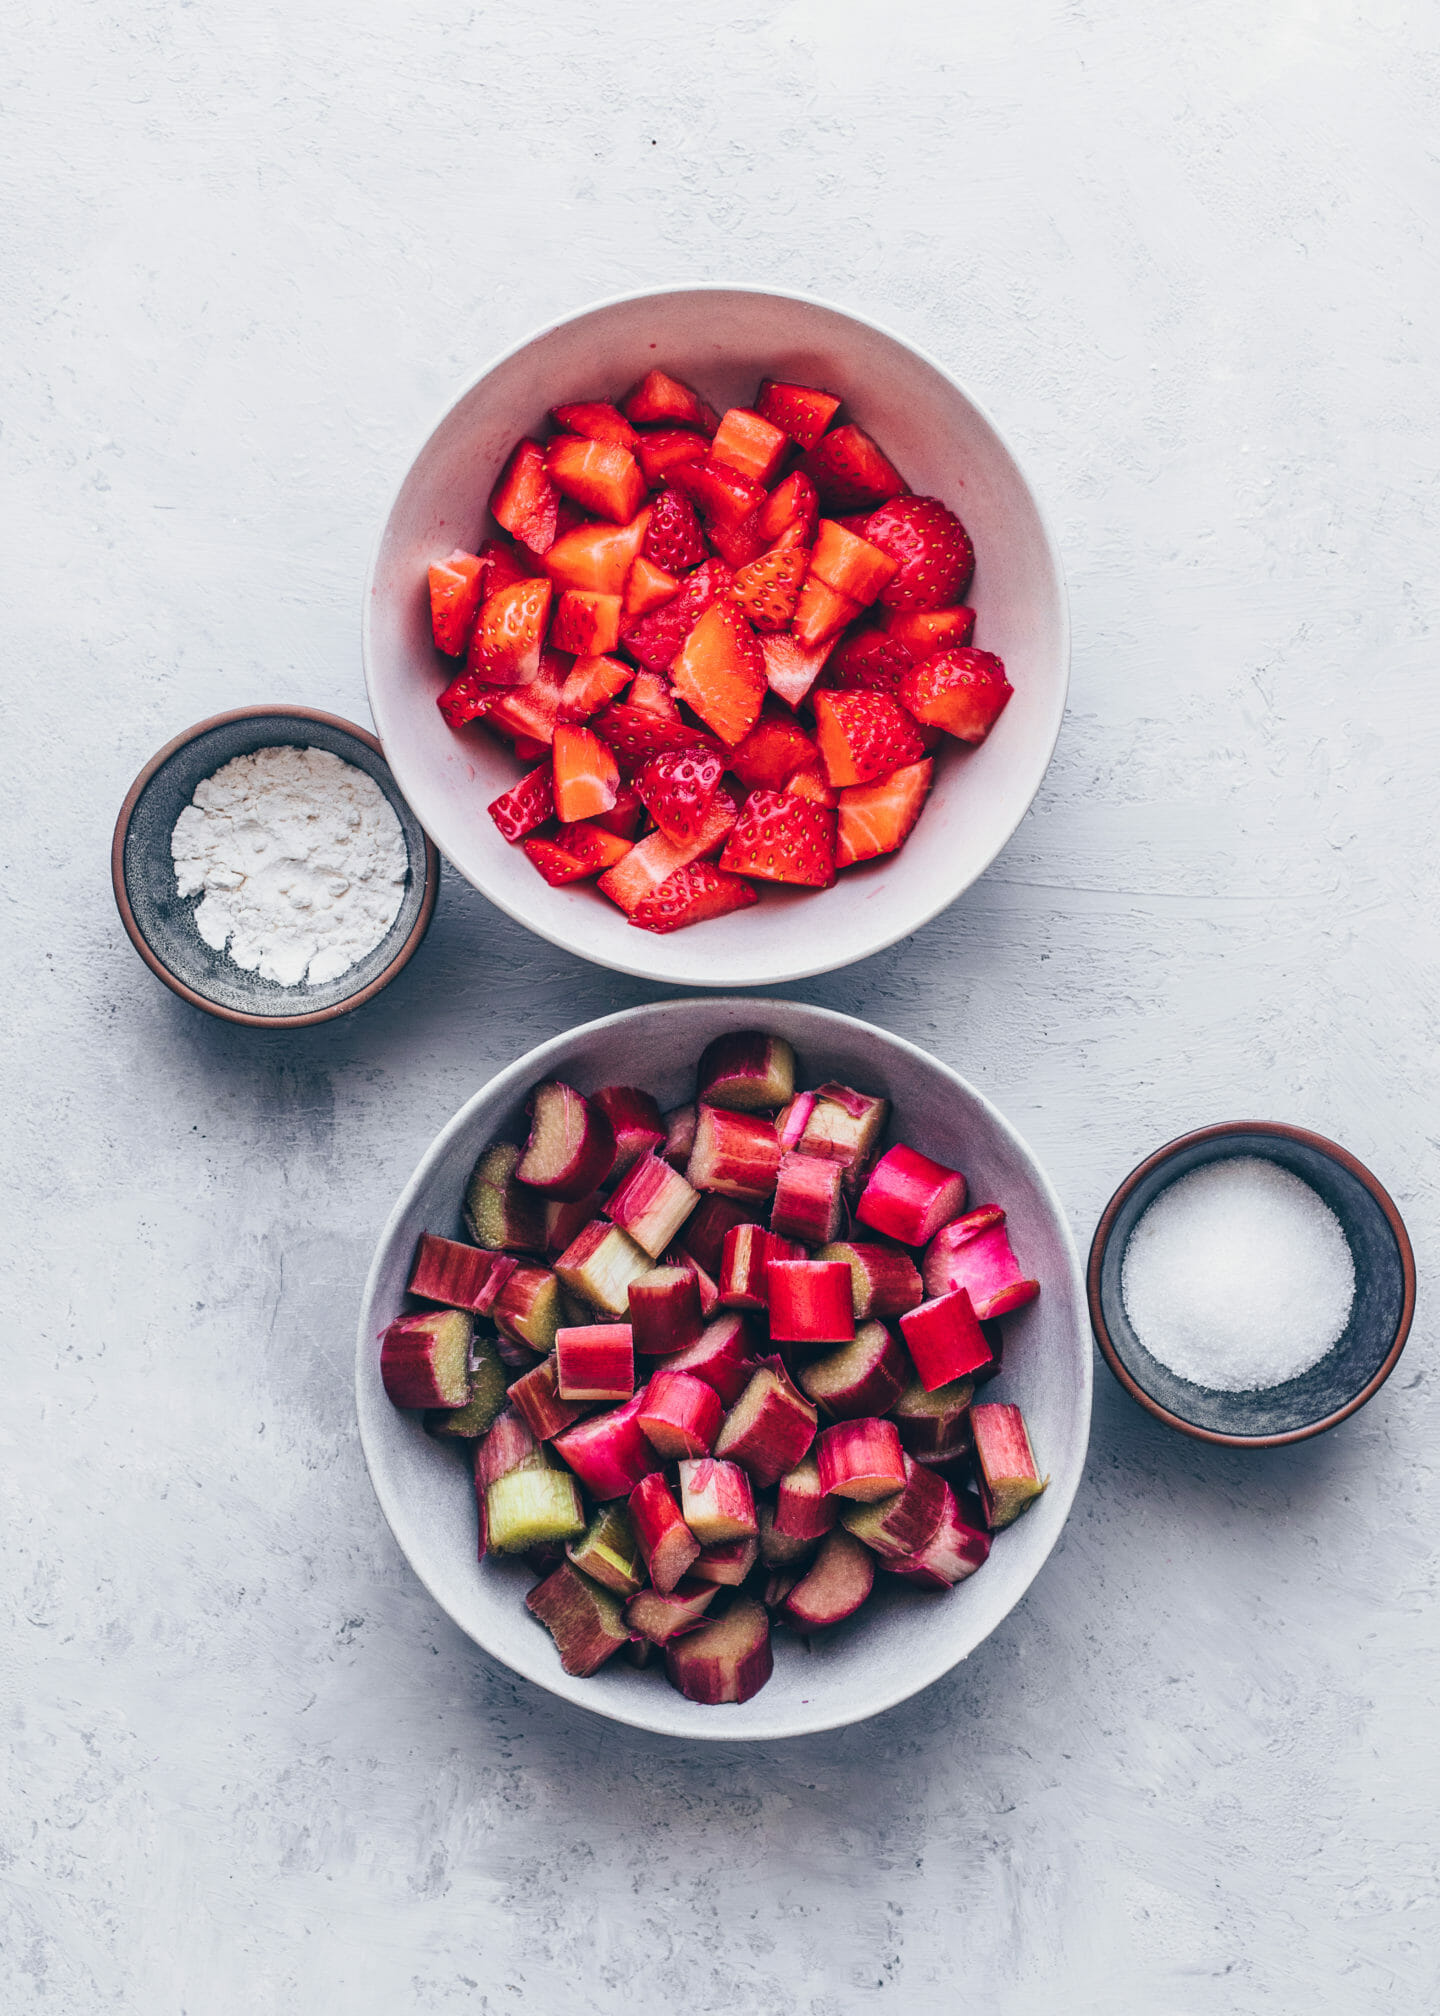 chopped rhubarb, strawberries, sugar and cornstarch